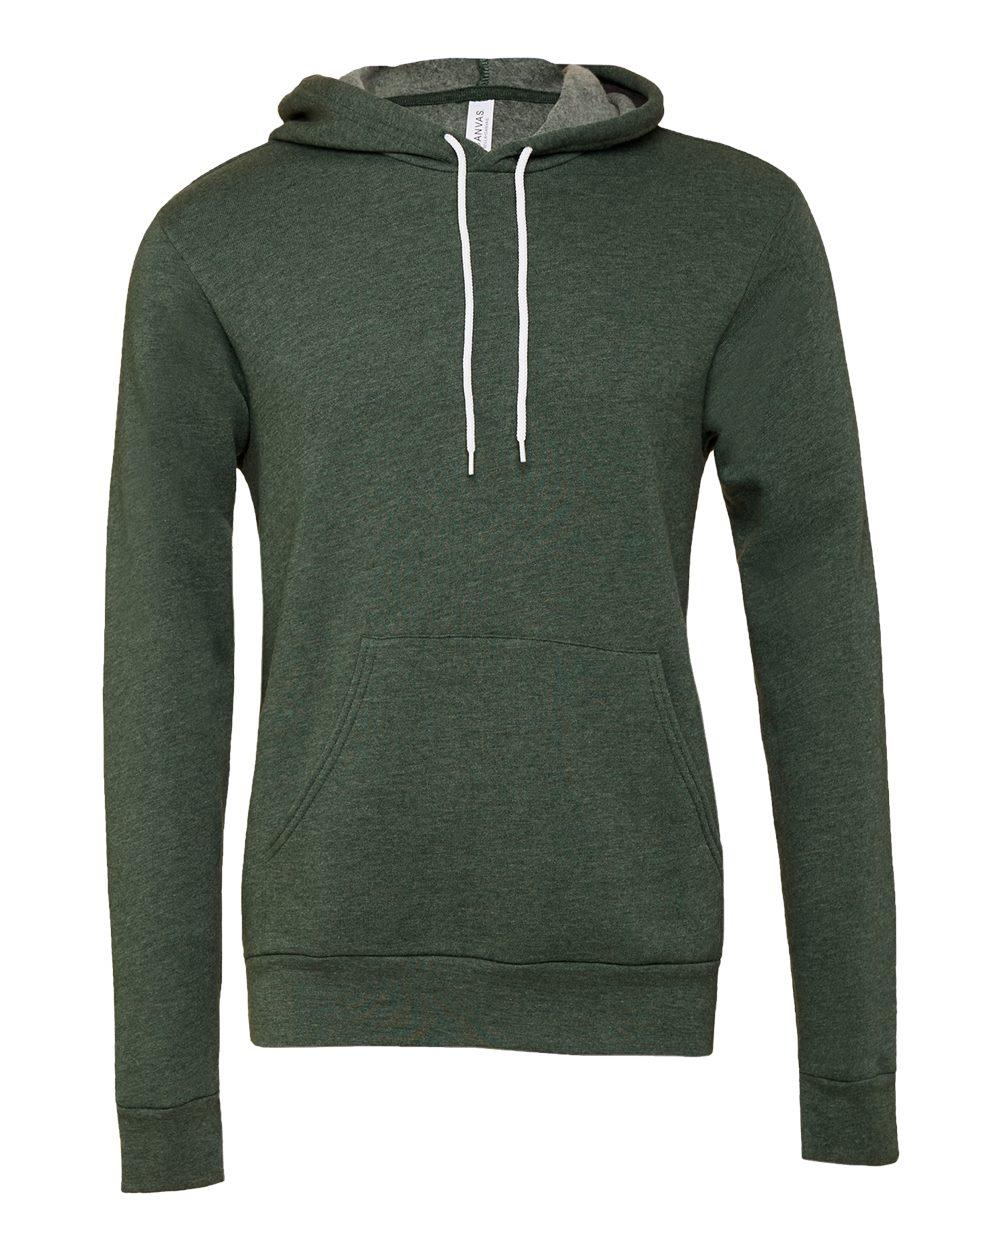 Bella-Canvas-Unisex-Sponge-Hooded-Pullover-Sweatshirt-Blank-3719-up-to-2XL thumbnail 44